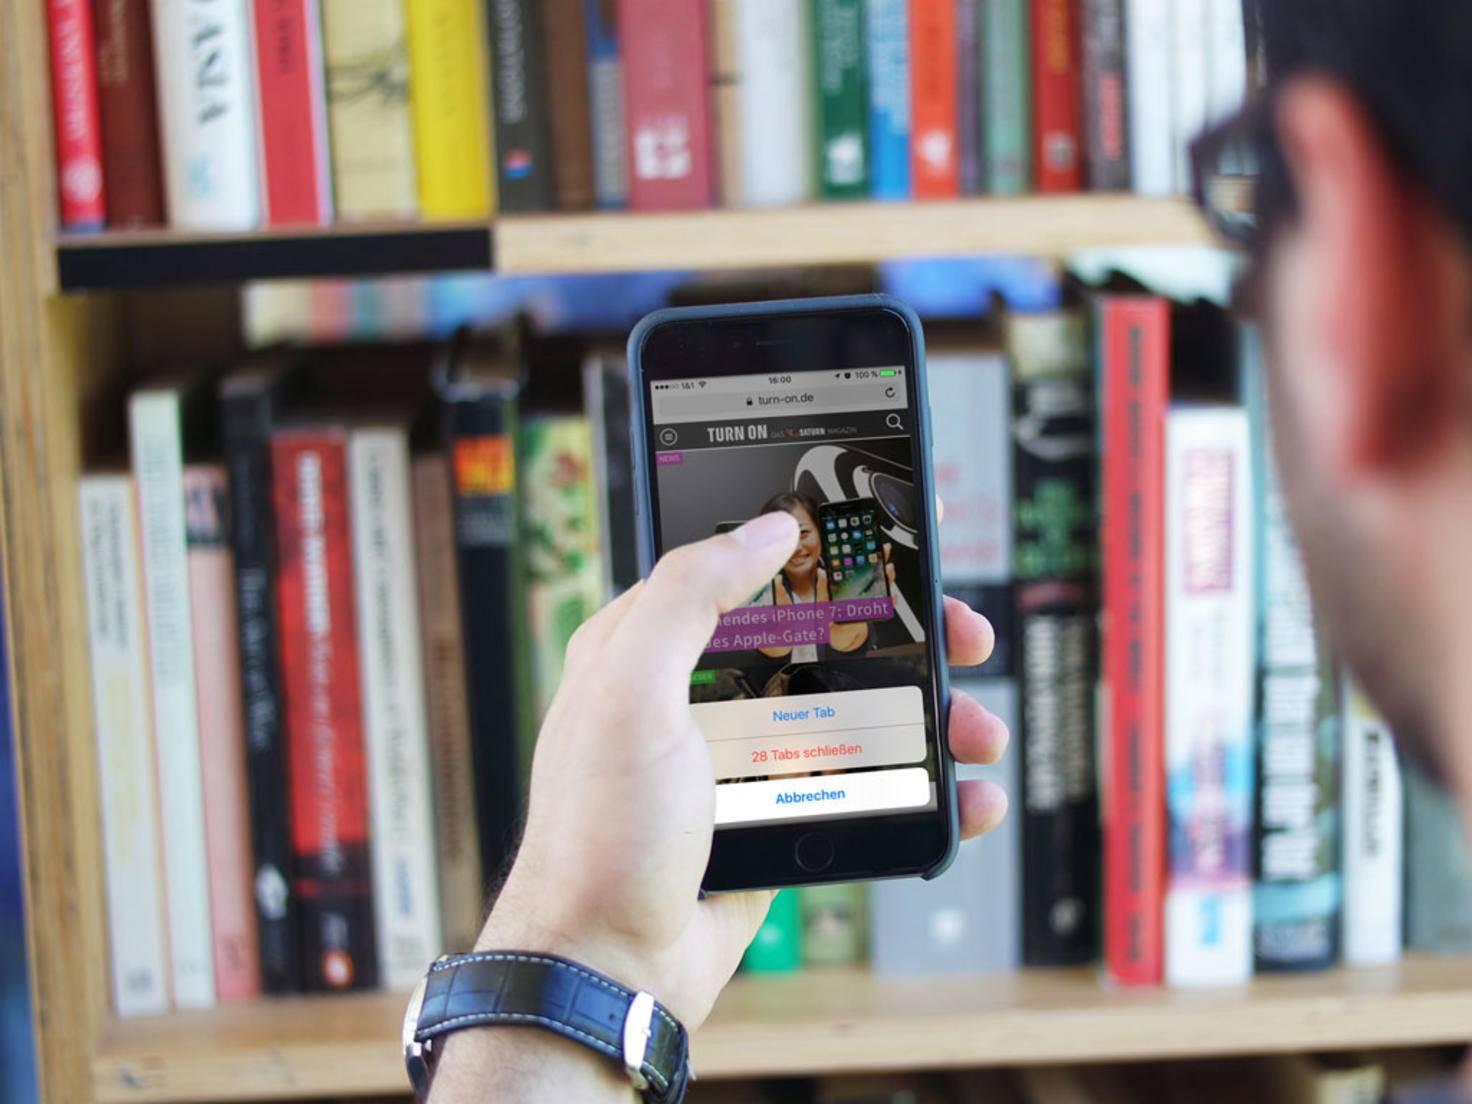 iOS 10: Alle Safari-Tabs schließen